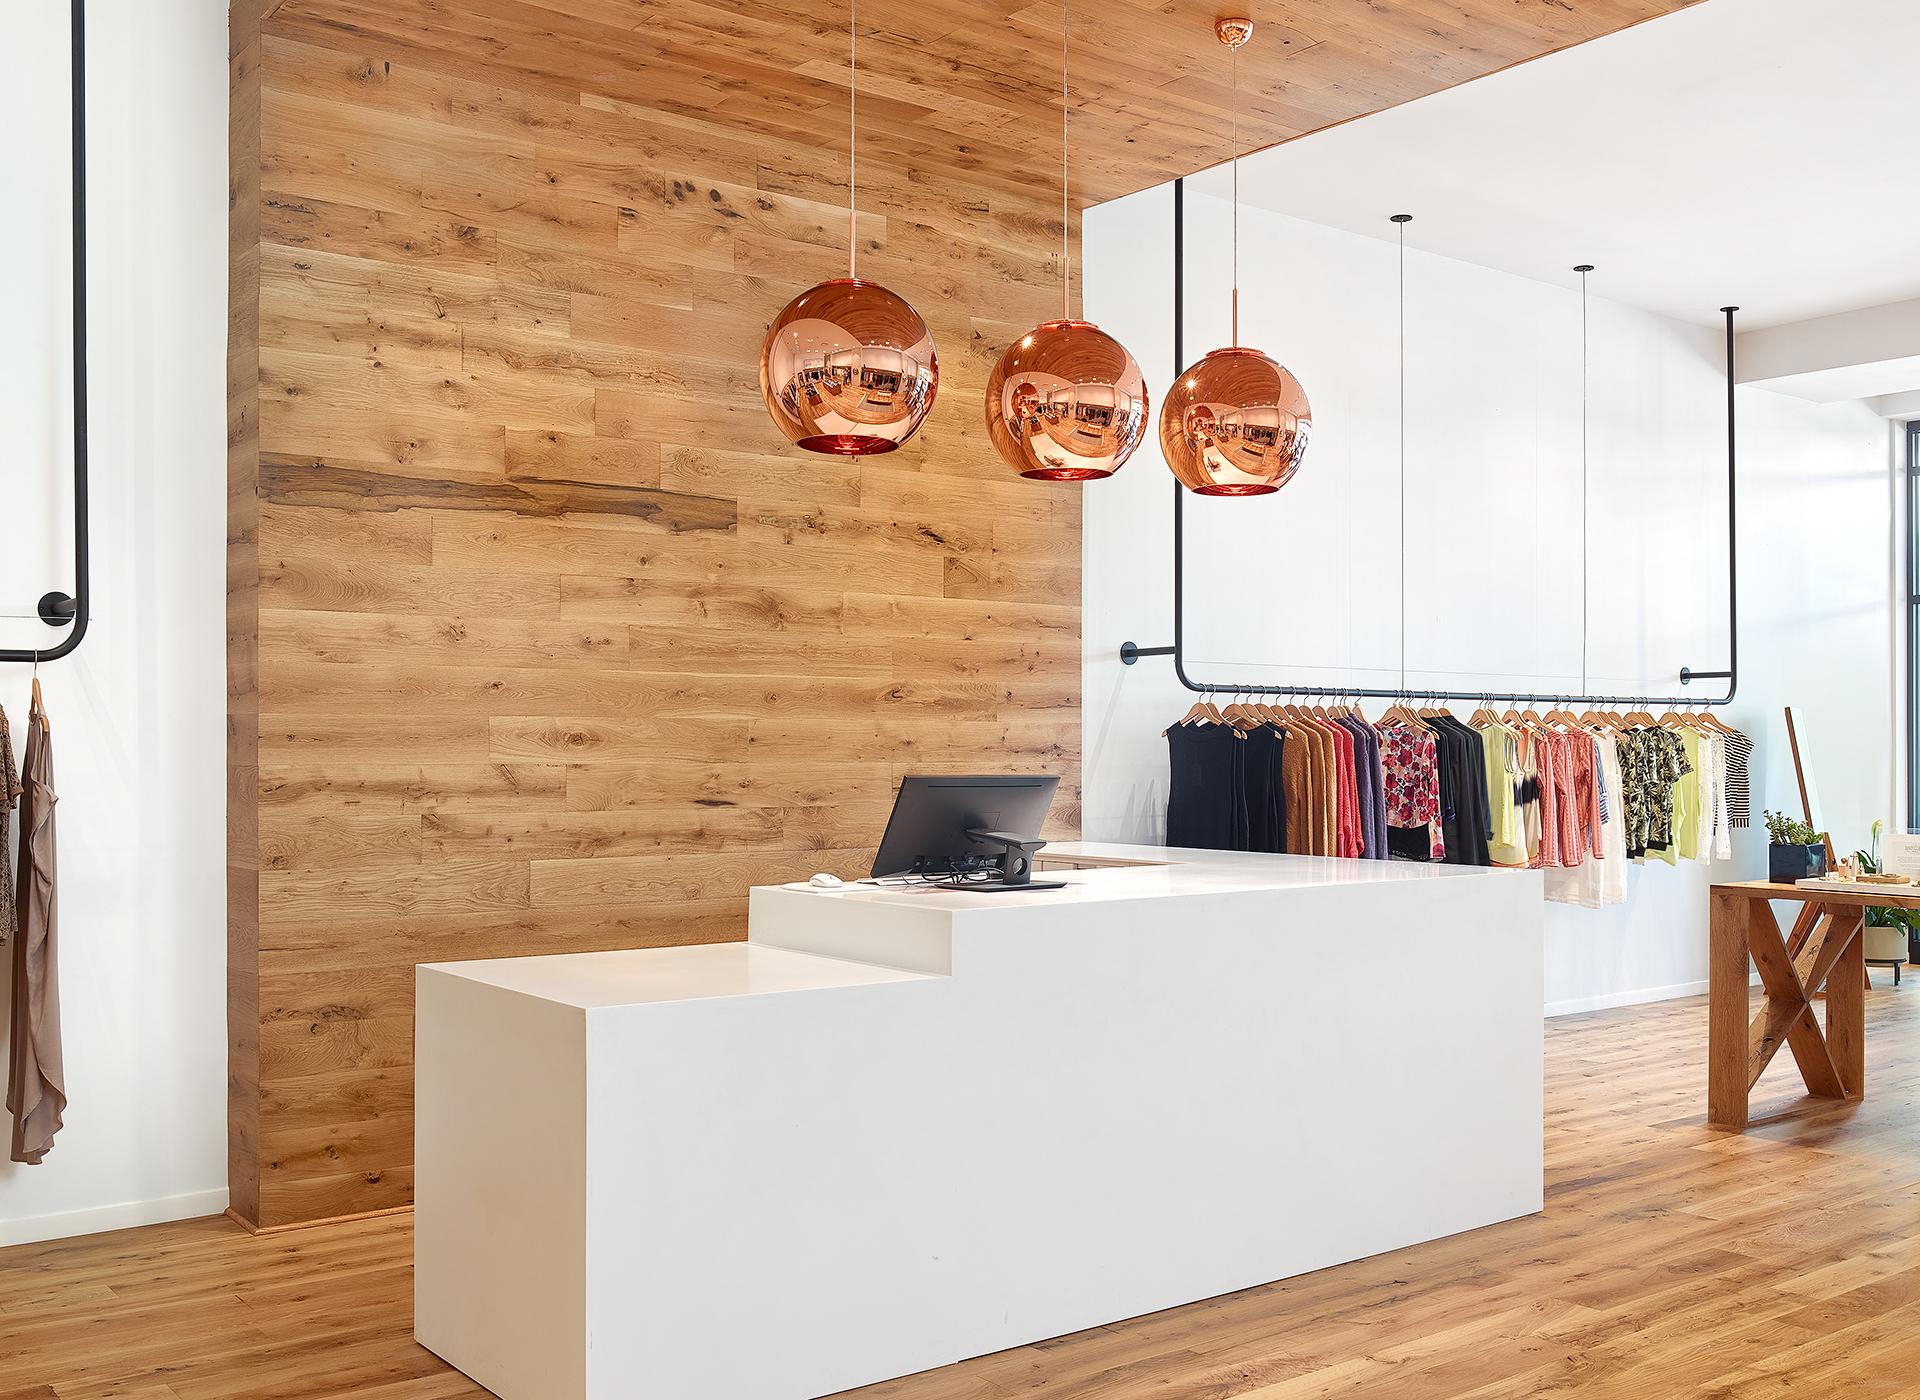 ©2017 Holger Obenaus Photography Interior Design Retail Commercial